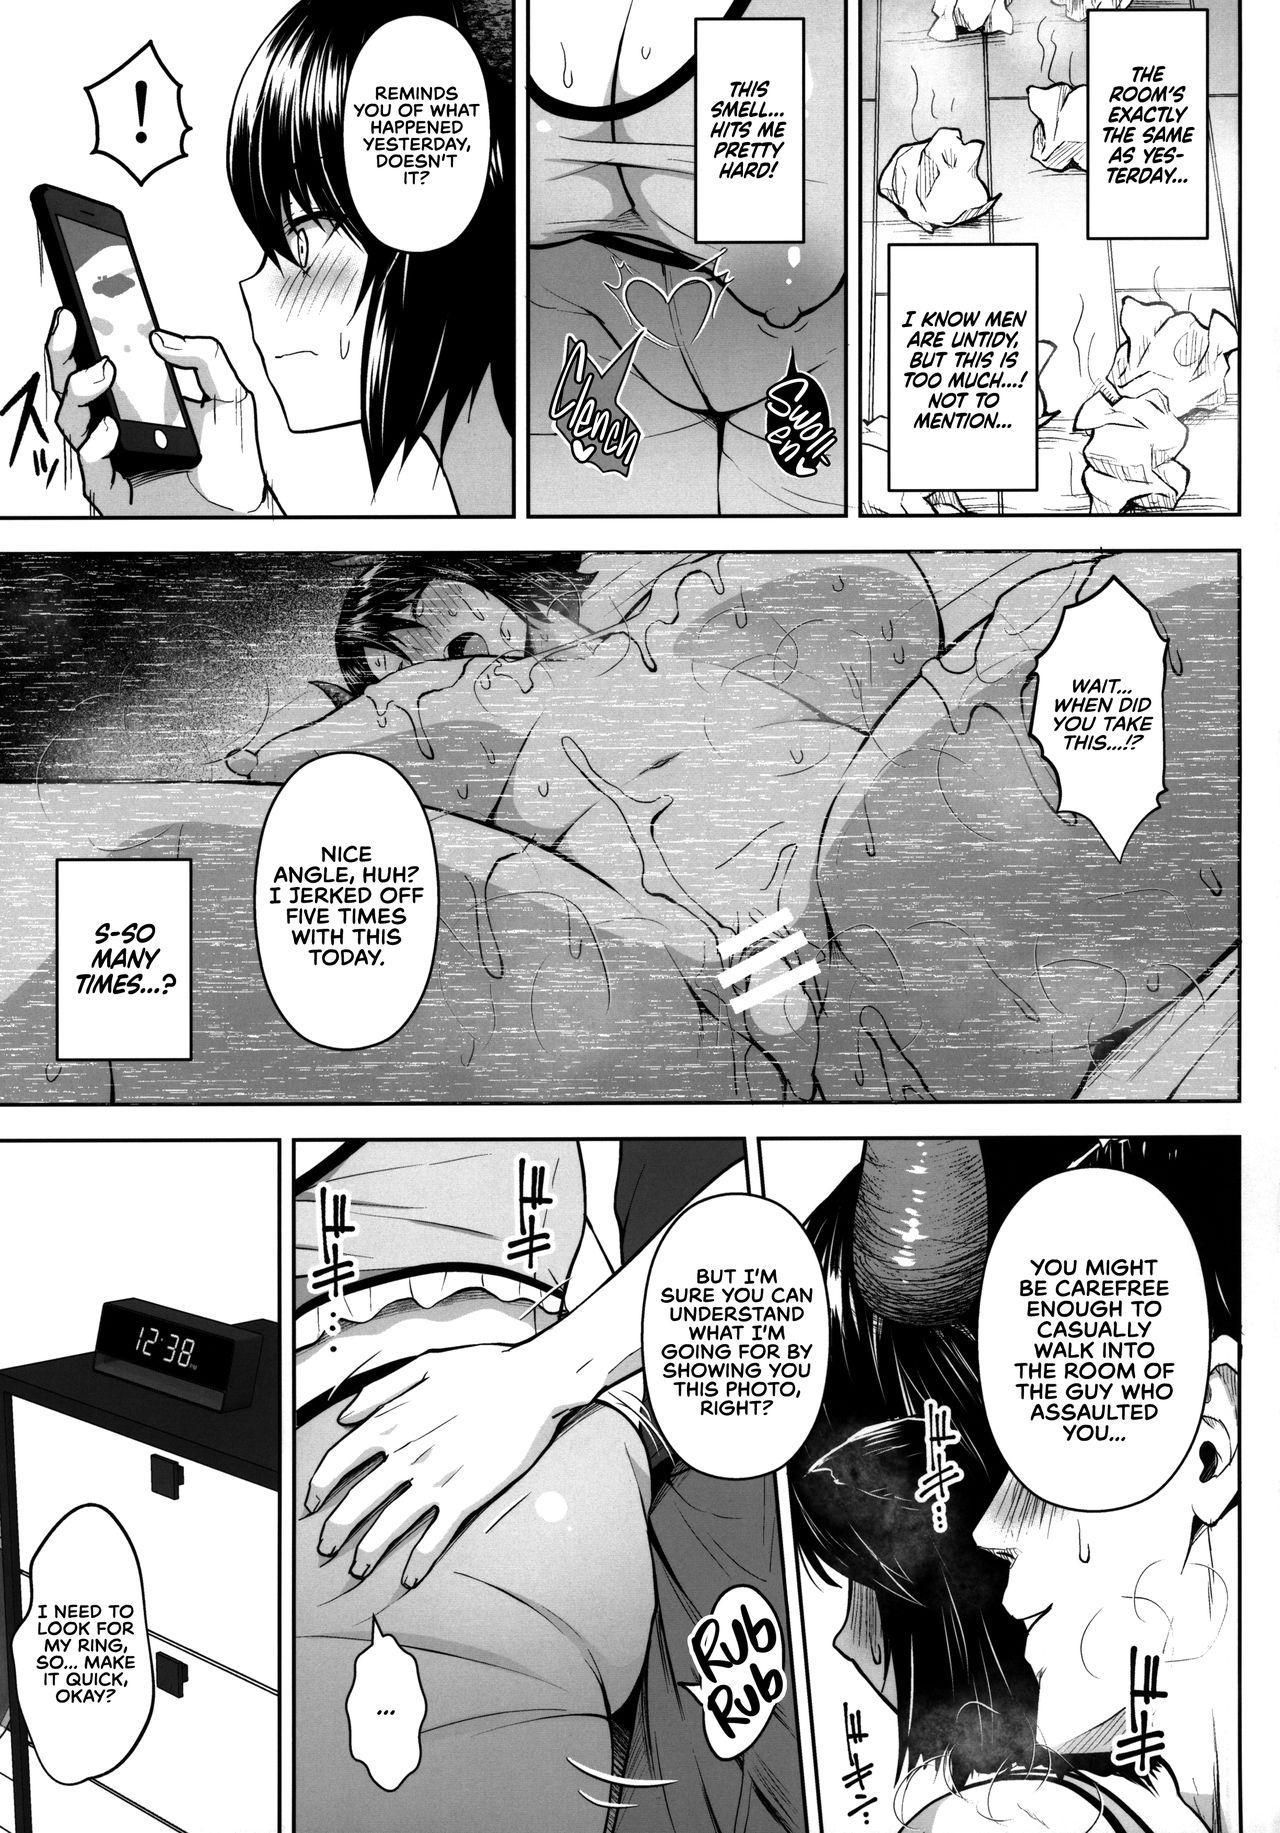 Oku-san no Oppai ga Dekasugiru noga Warui! 2 | It's Your Fault for Having Such Big Boobs, Miss! 2 4